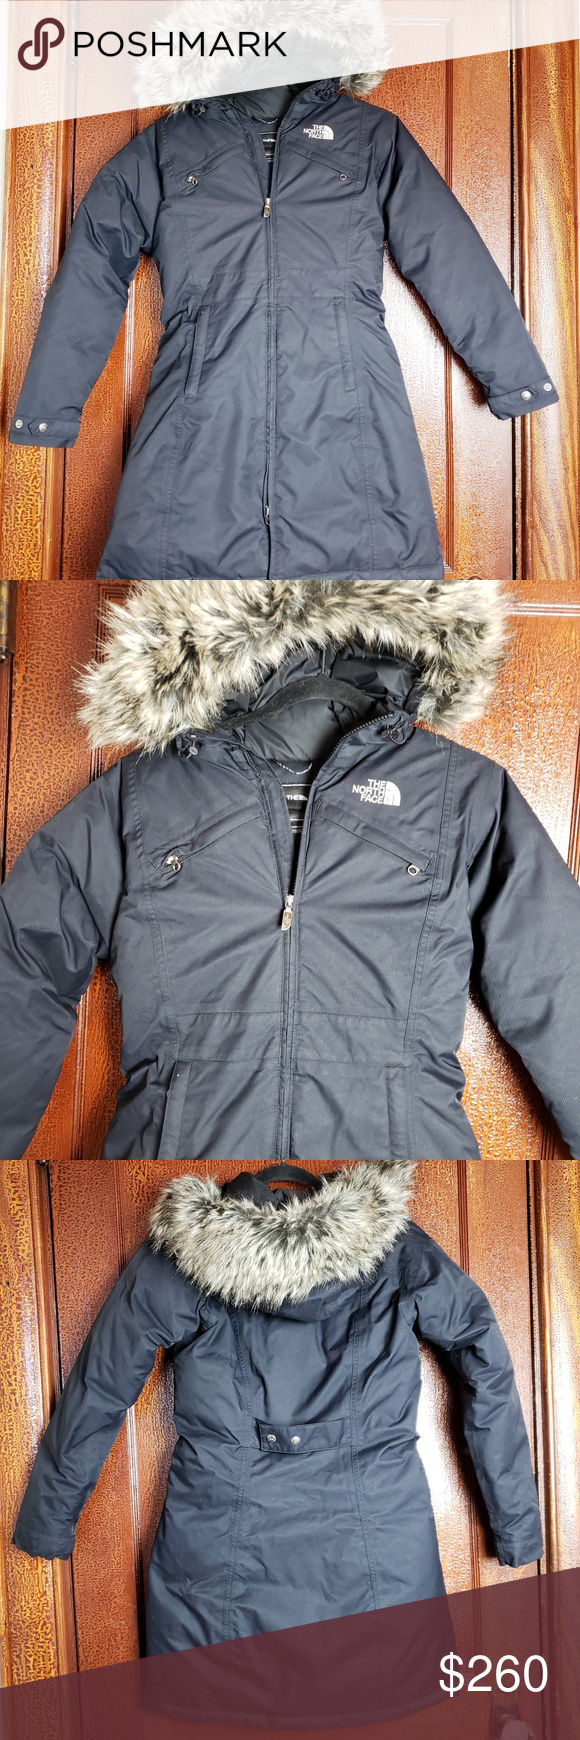 The North Face Faux Fur Hood Arctic Parka Coat Xs The North Face Arctic Parka Black Full Length Zip With Snap Button Faux Fur Hood Clothes Design Parka Coat [ 1740 x 580 Pixel ]